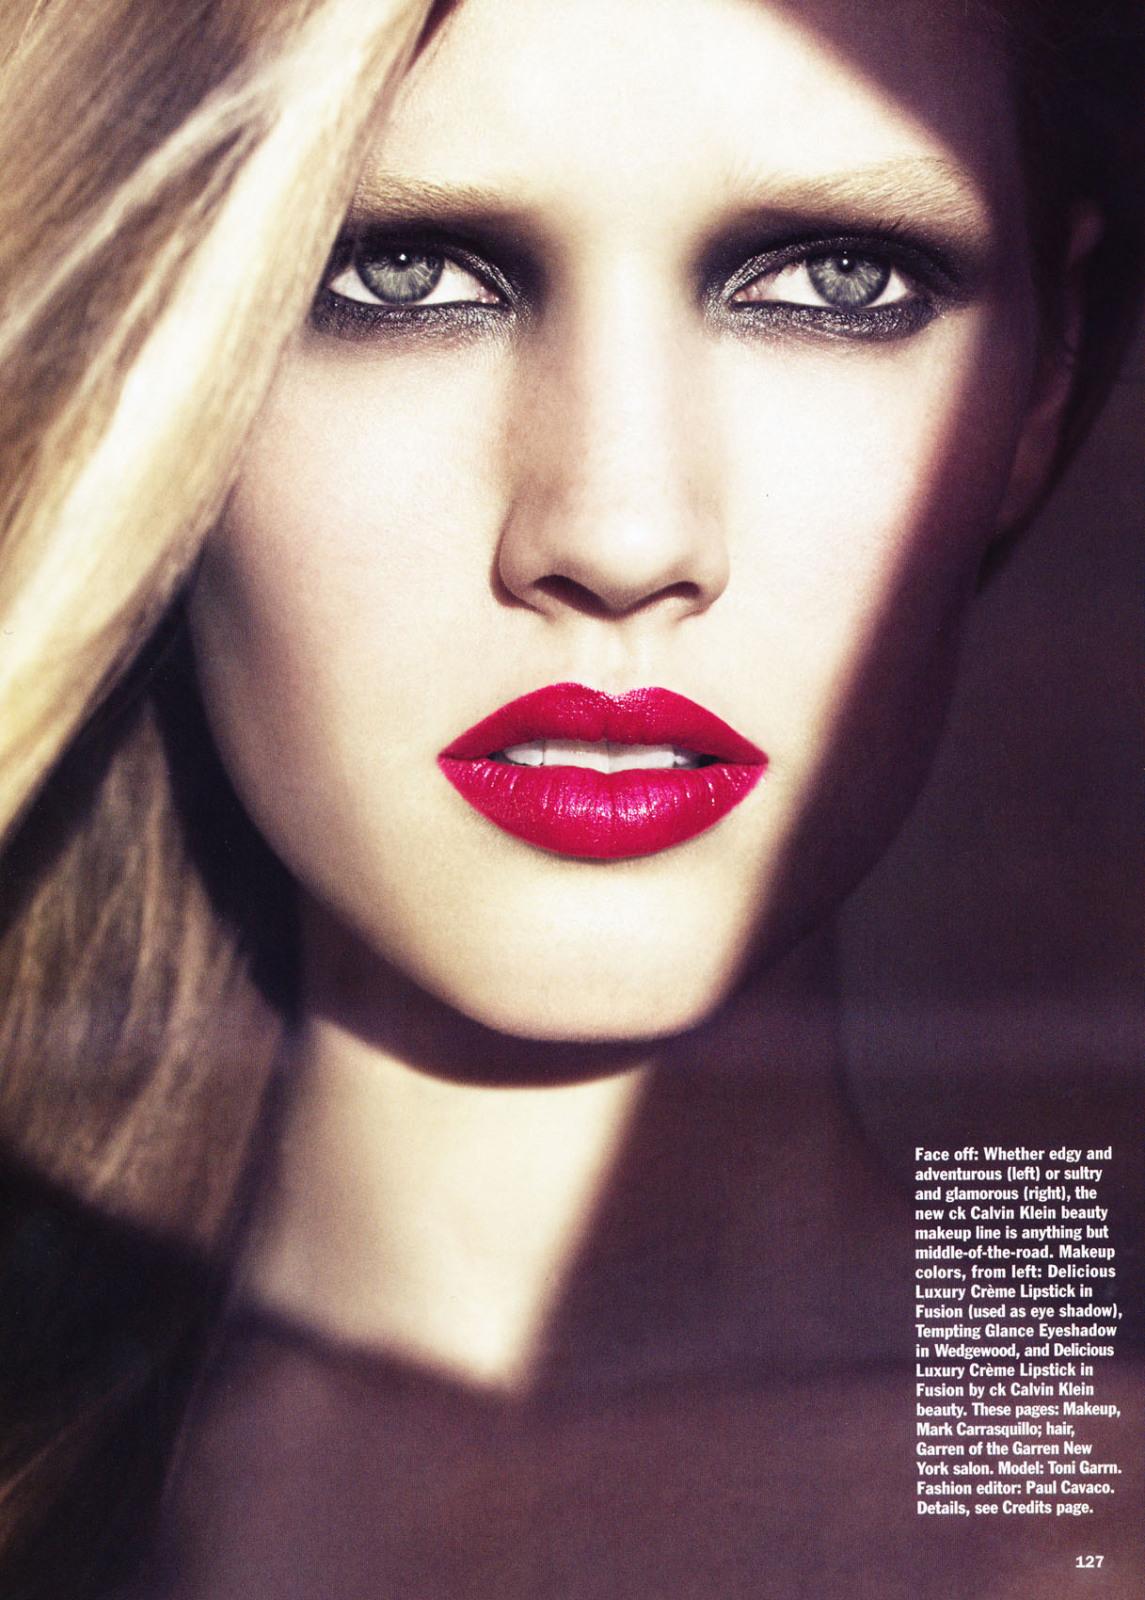 woman,women,fashion,photography,style,mode,feminine,female,michael thompson